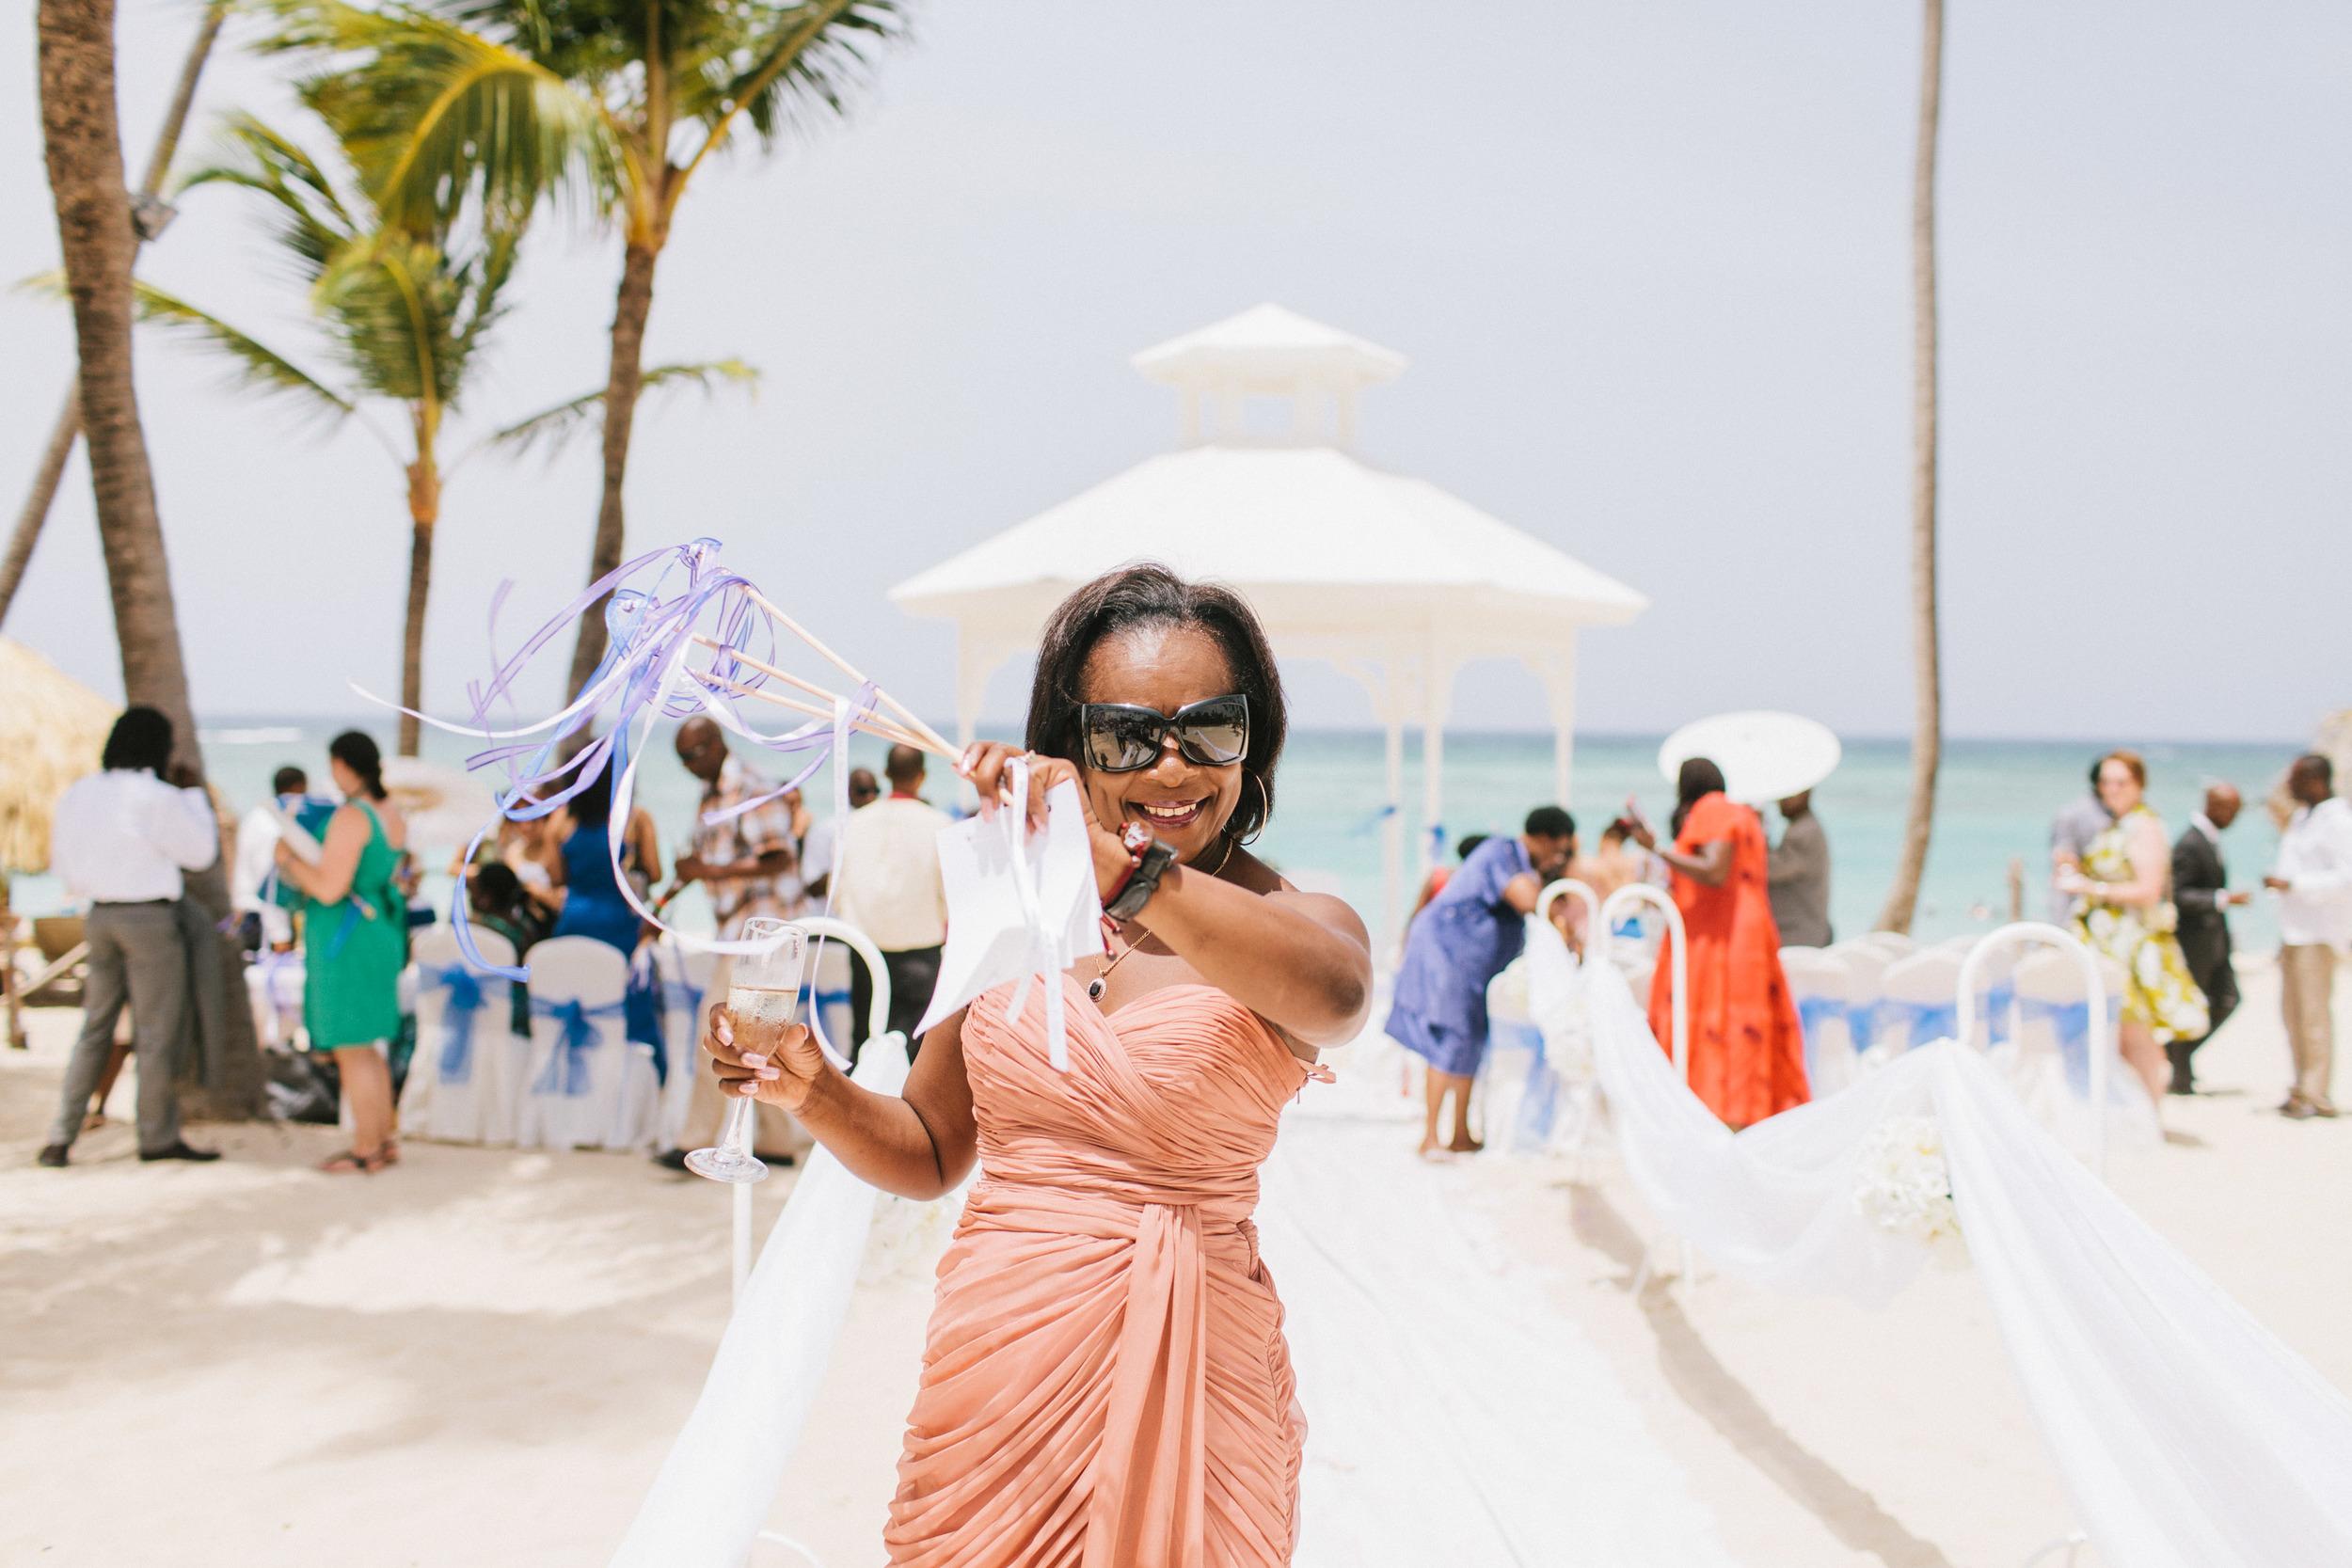 michael-rousseau-photography-dominican-republic-destination-wedding-cara-jason-colonial-majestic-dominican-republic084.jpg